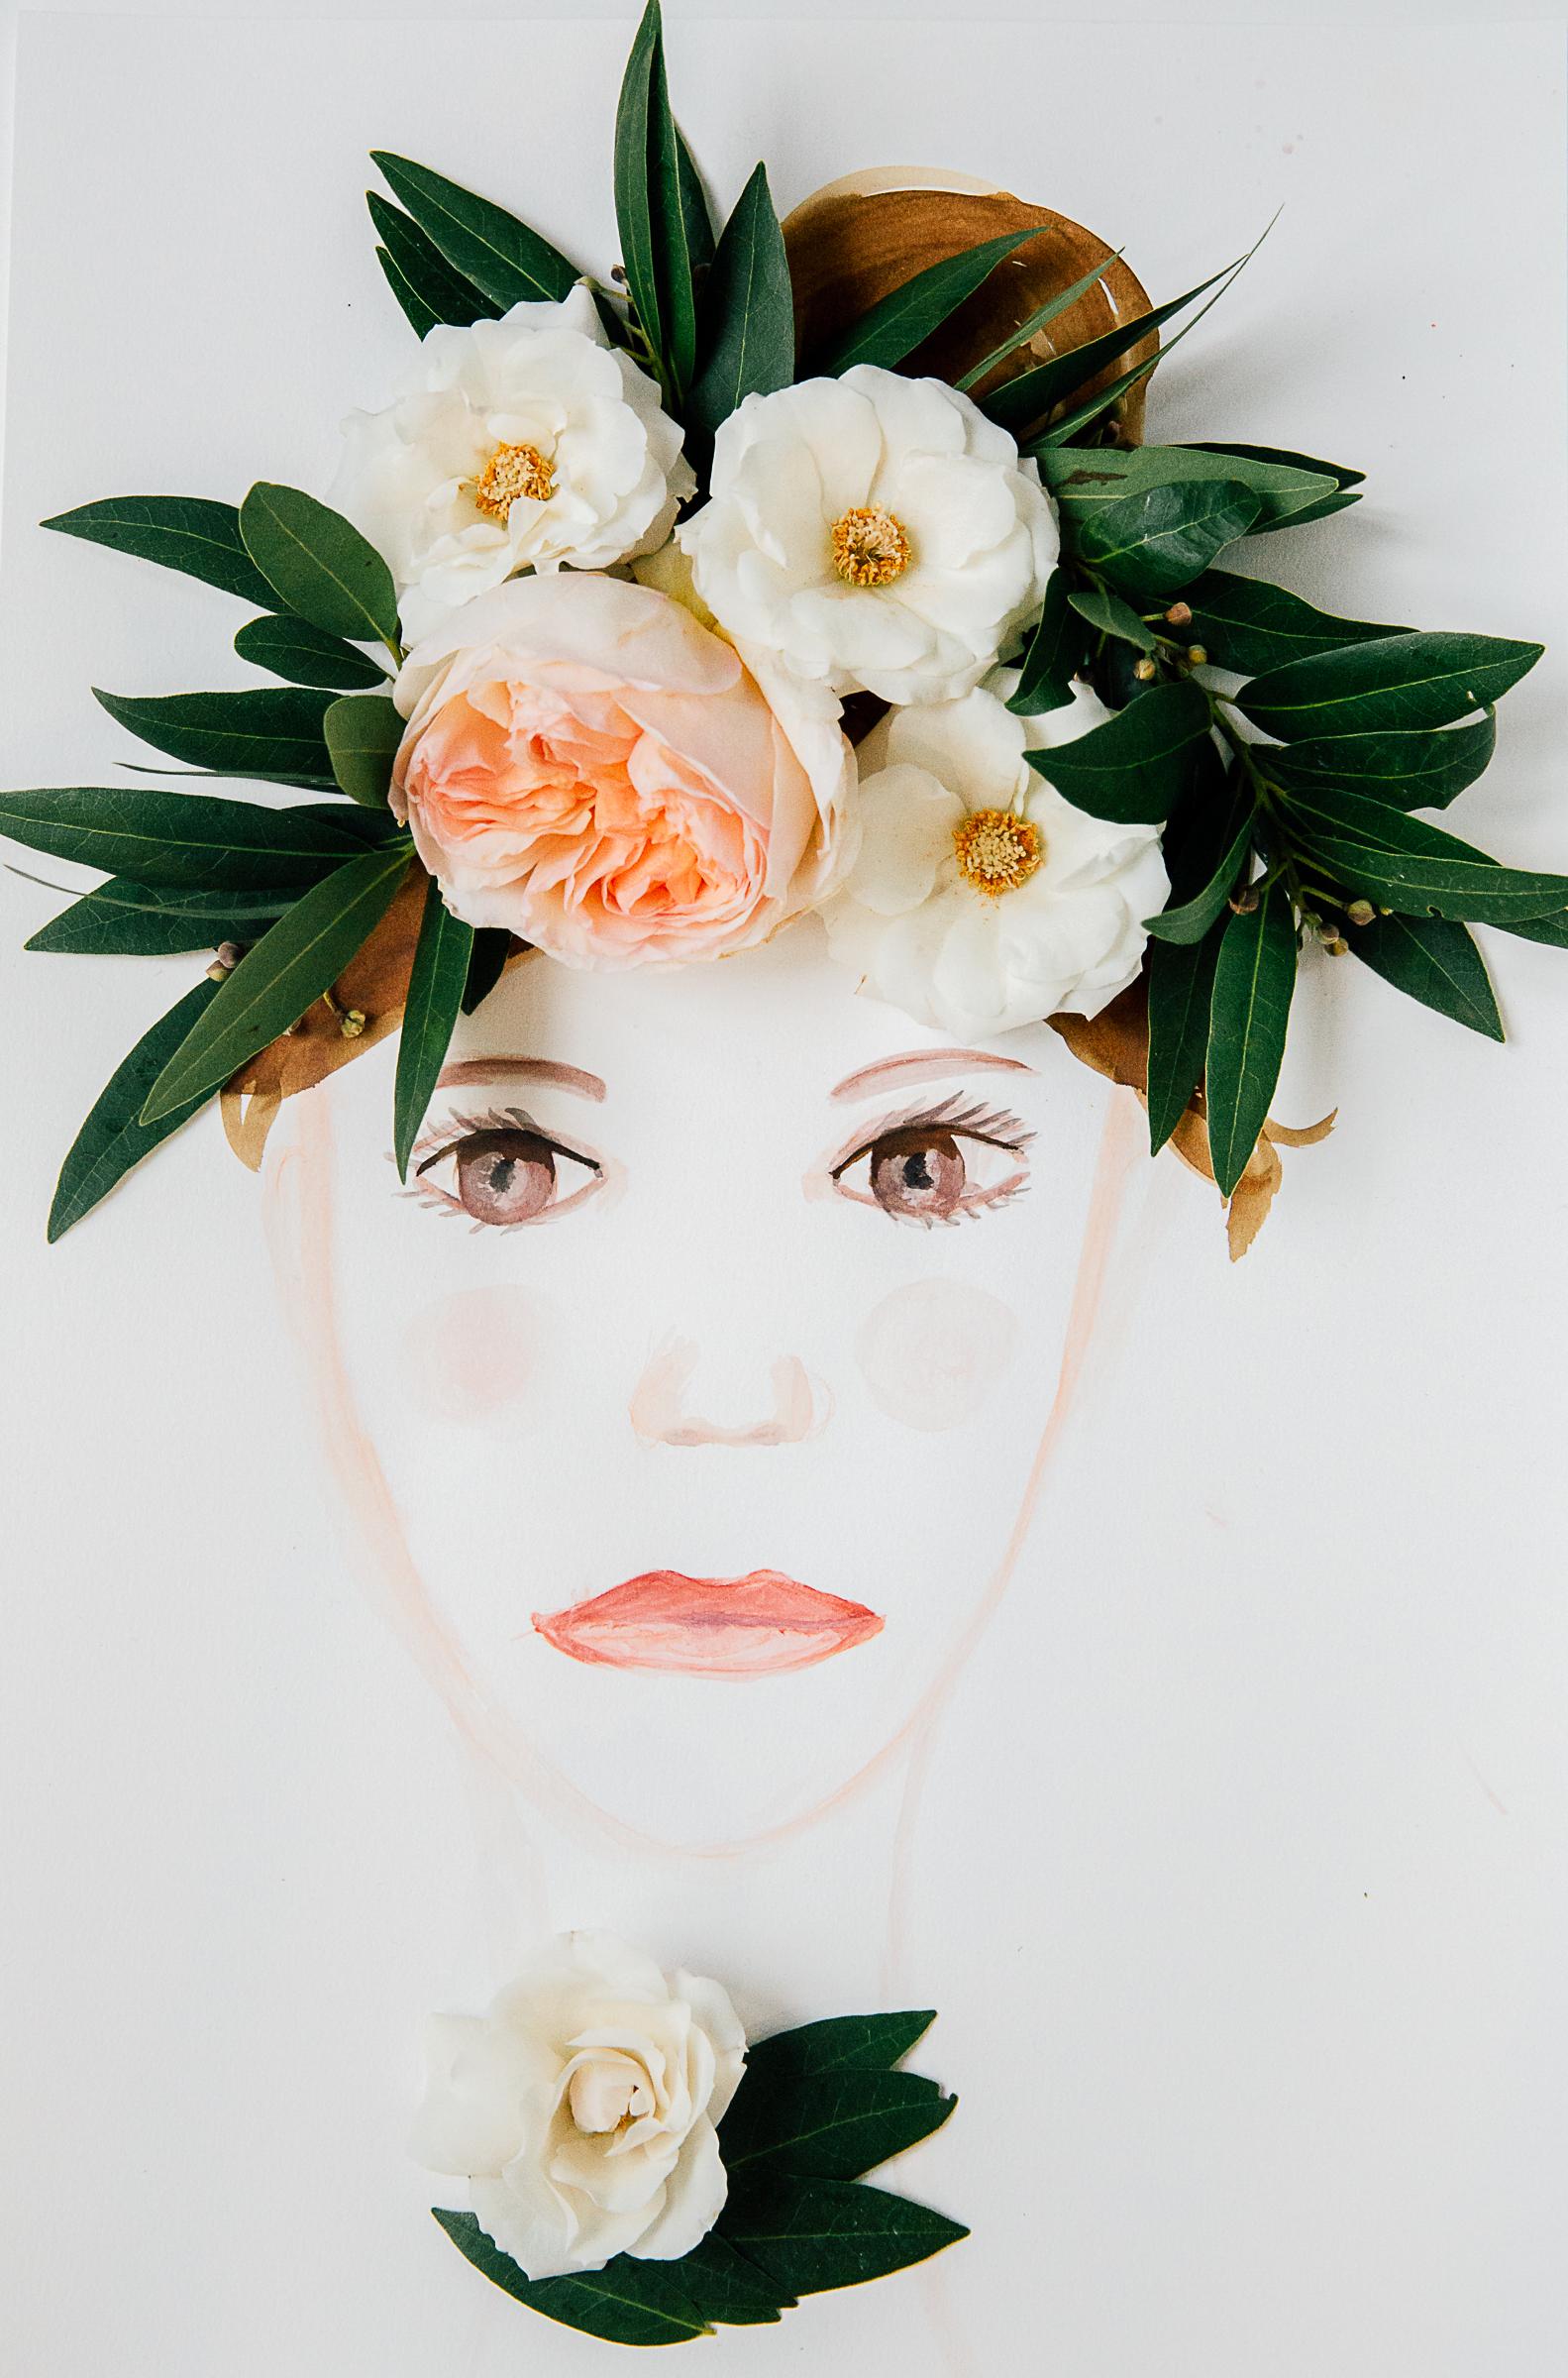 petal-portraits-make-flower-furbish-1029.jpg